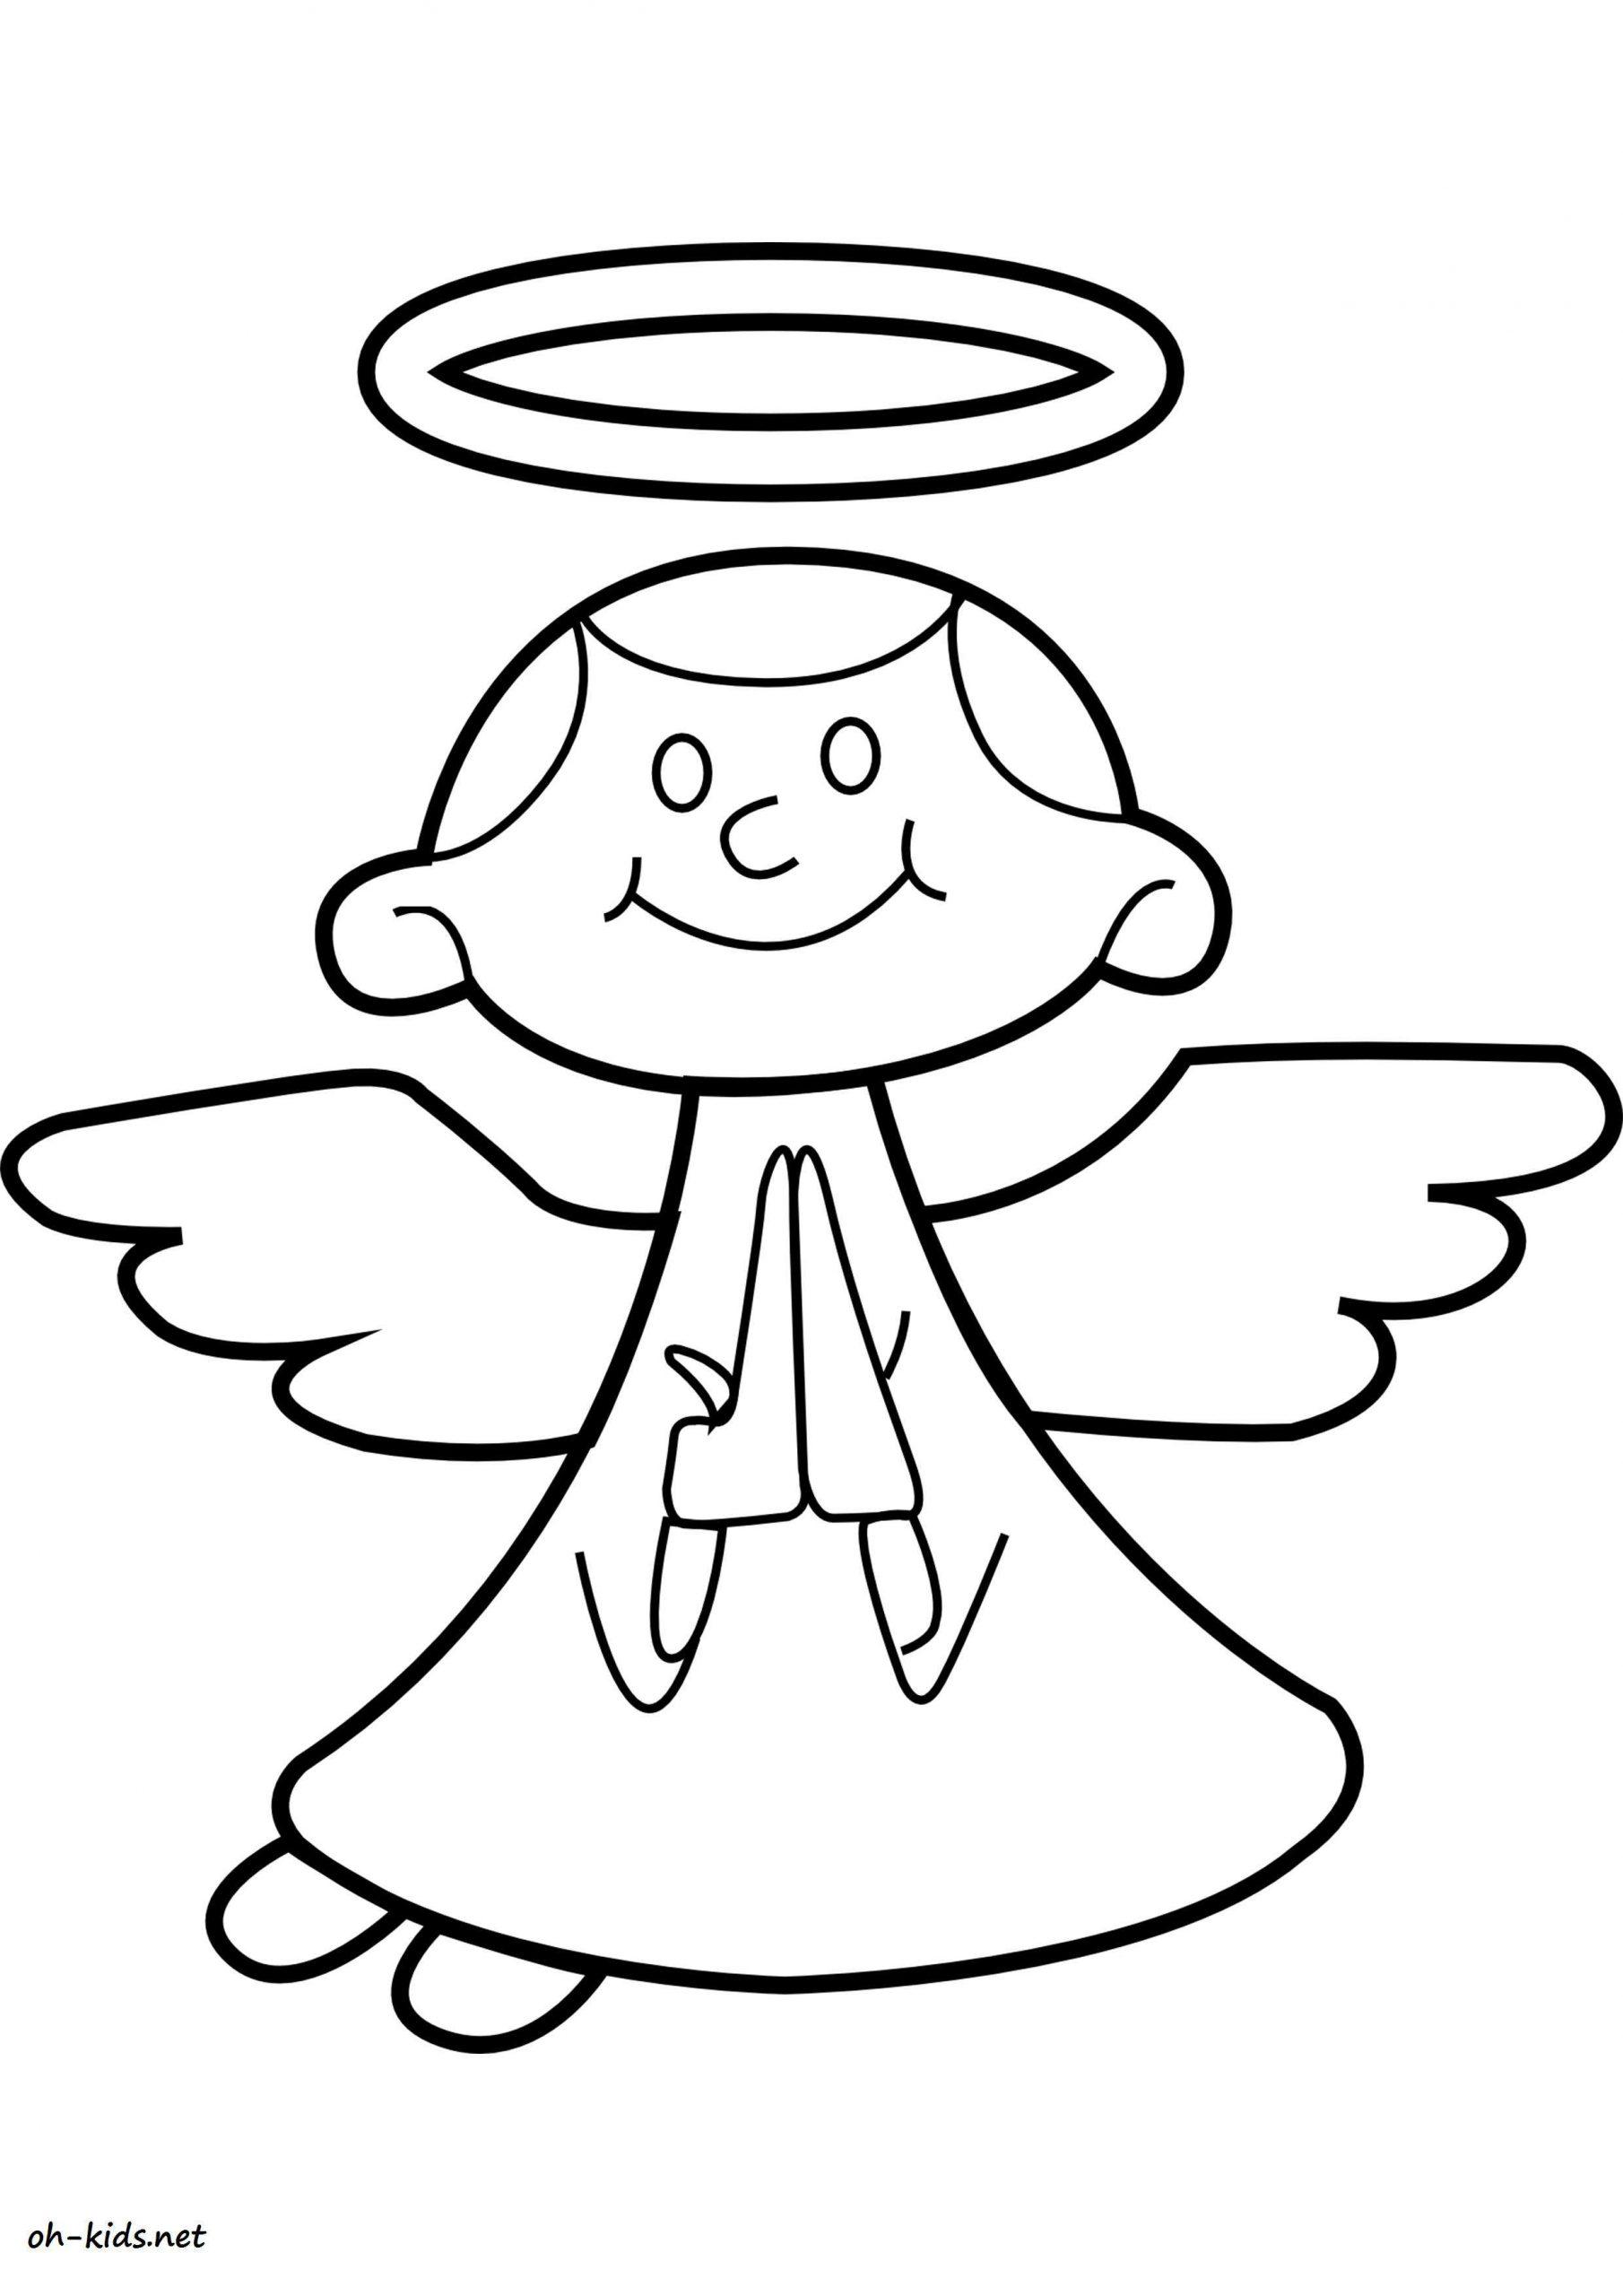 Coloriage Ange - Oh Kids Fr concernant Ange A Colorier